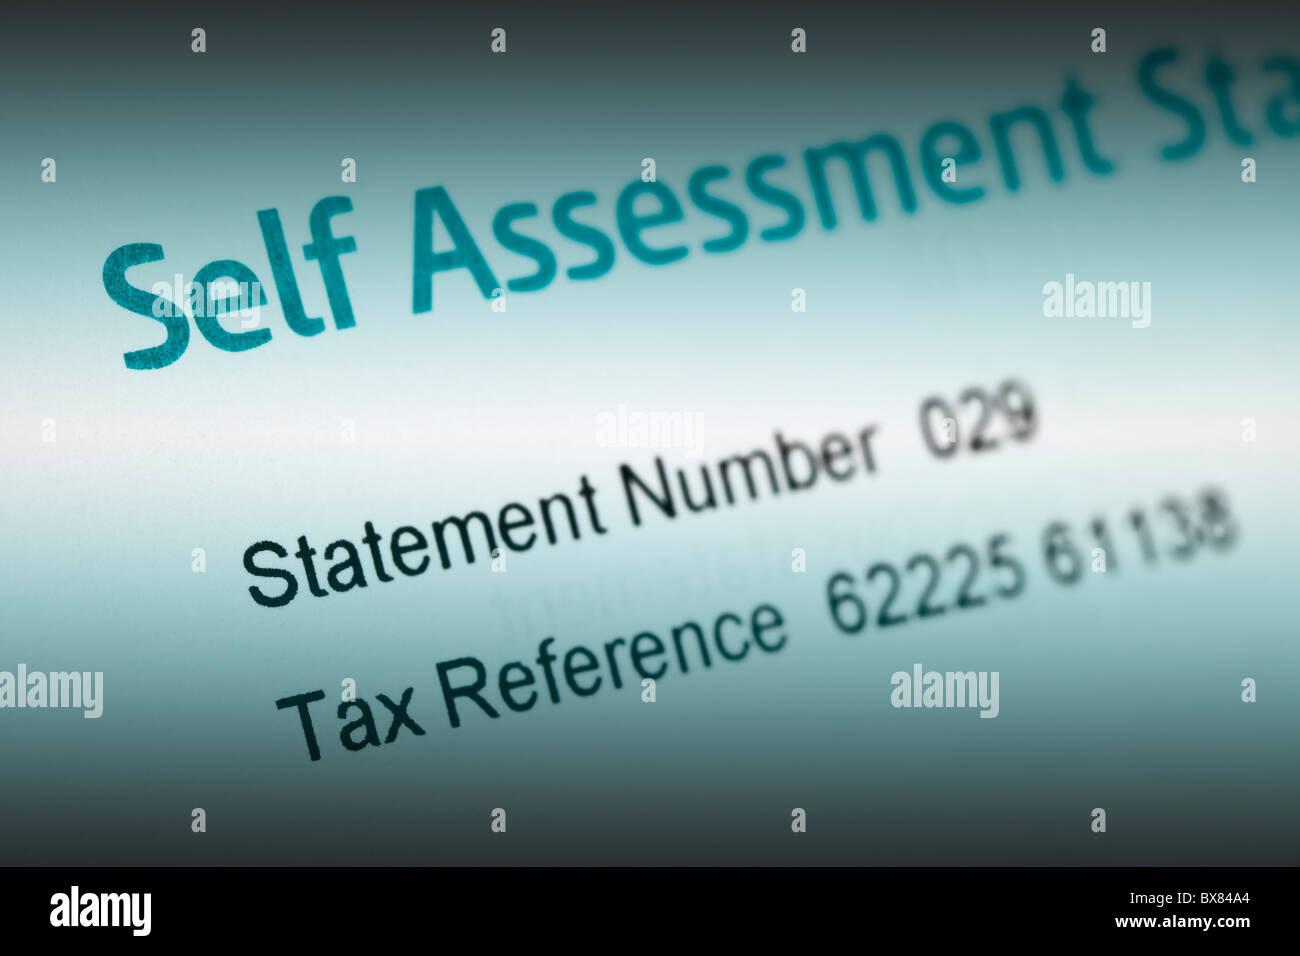 UK tax hm revenue & customs self assessment statement - Stock Image